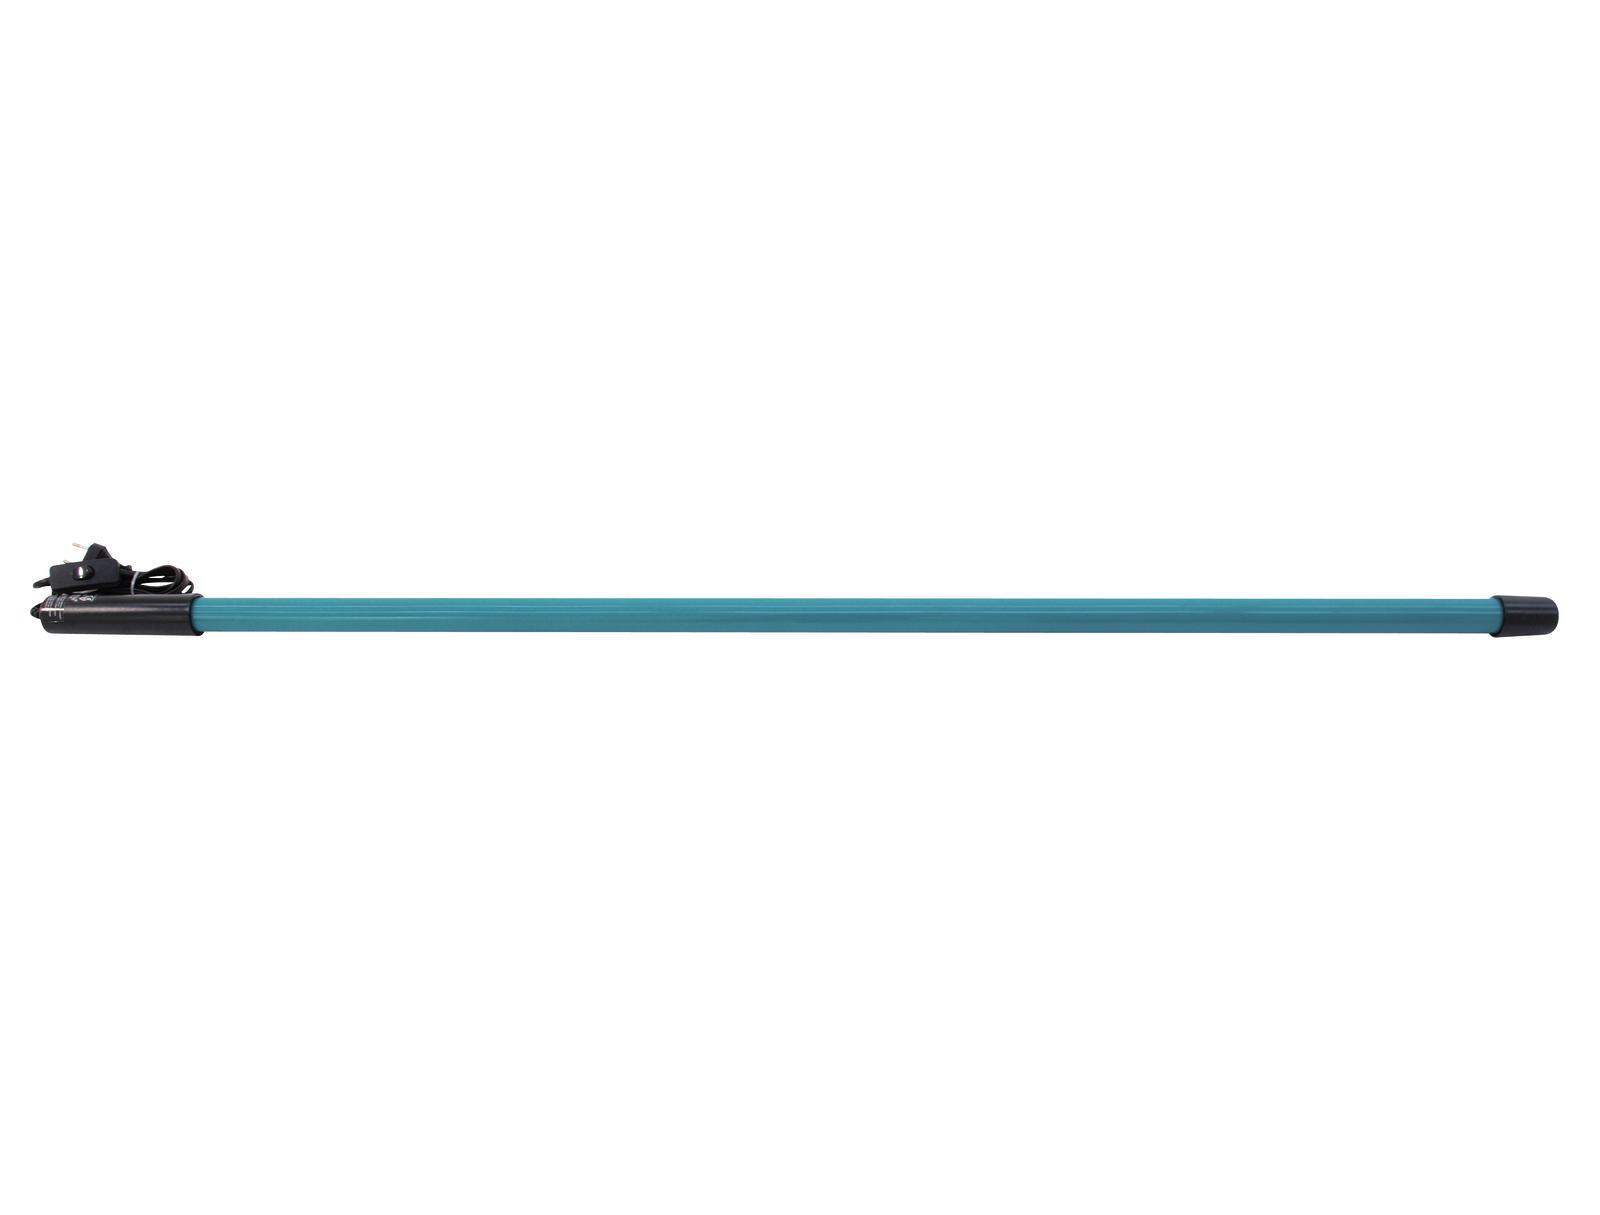 EUROLITE Neon stick Light Tube T8 36W 134cm Heavenly turquoise L